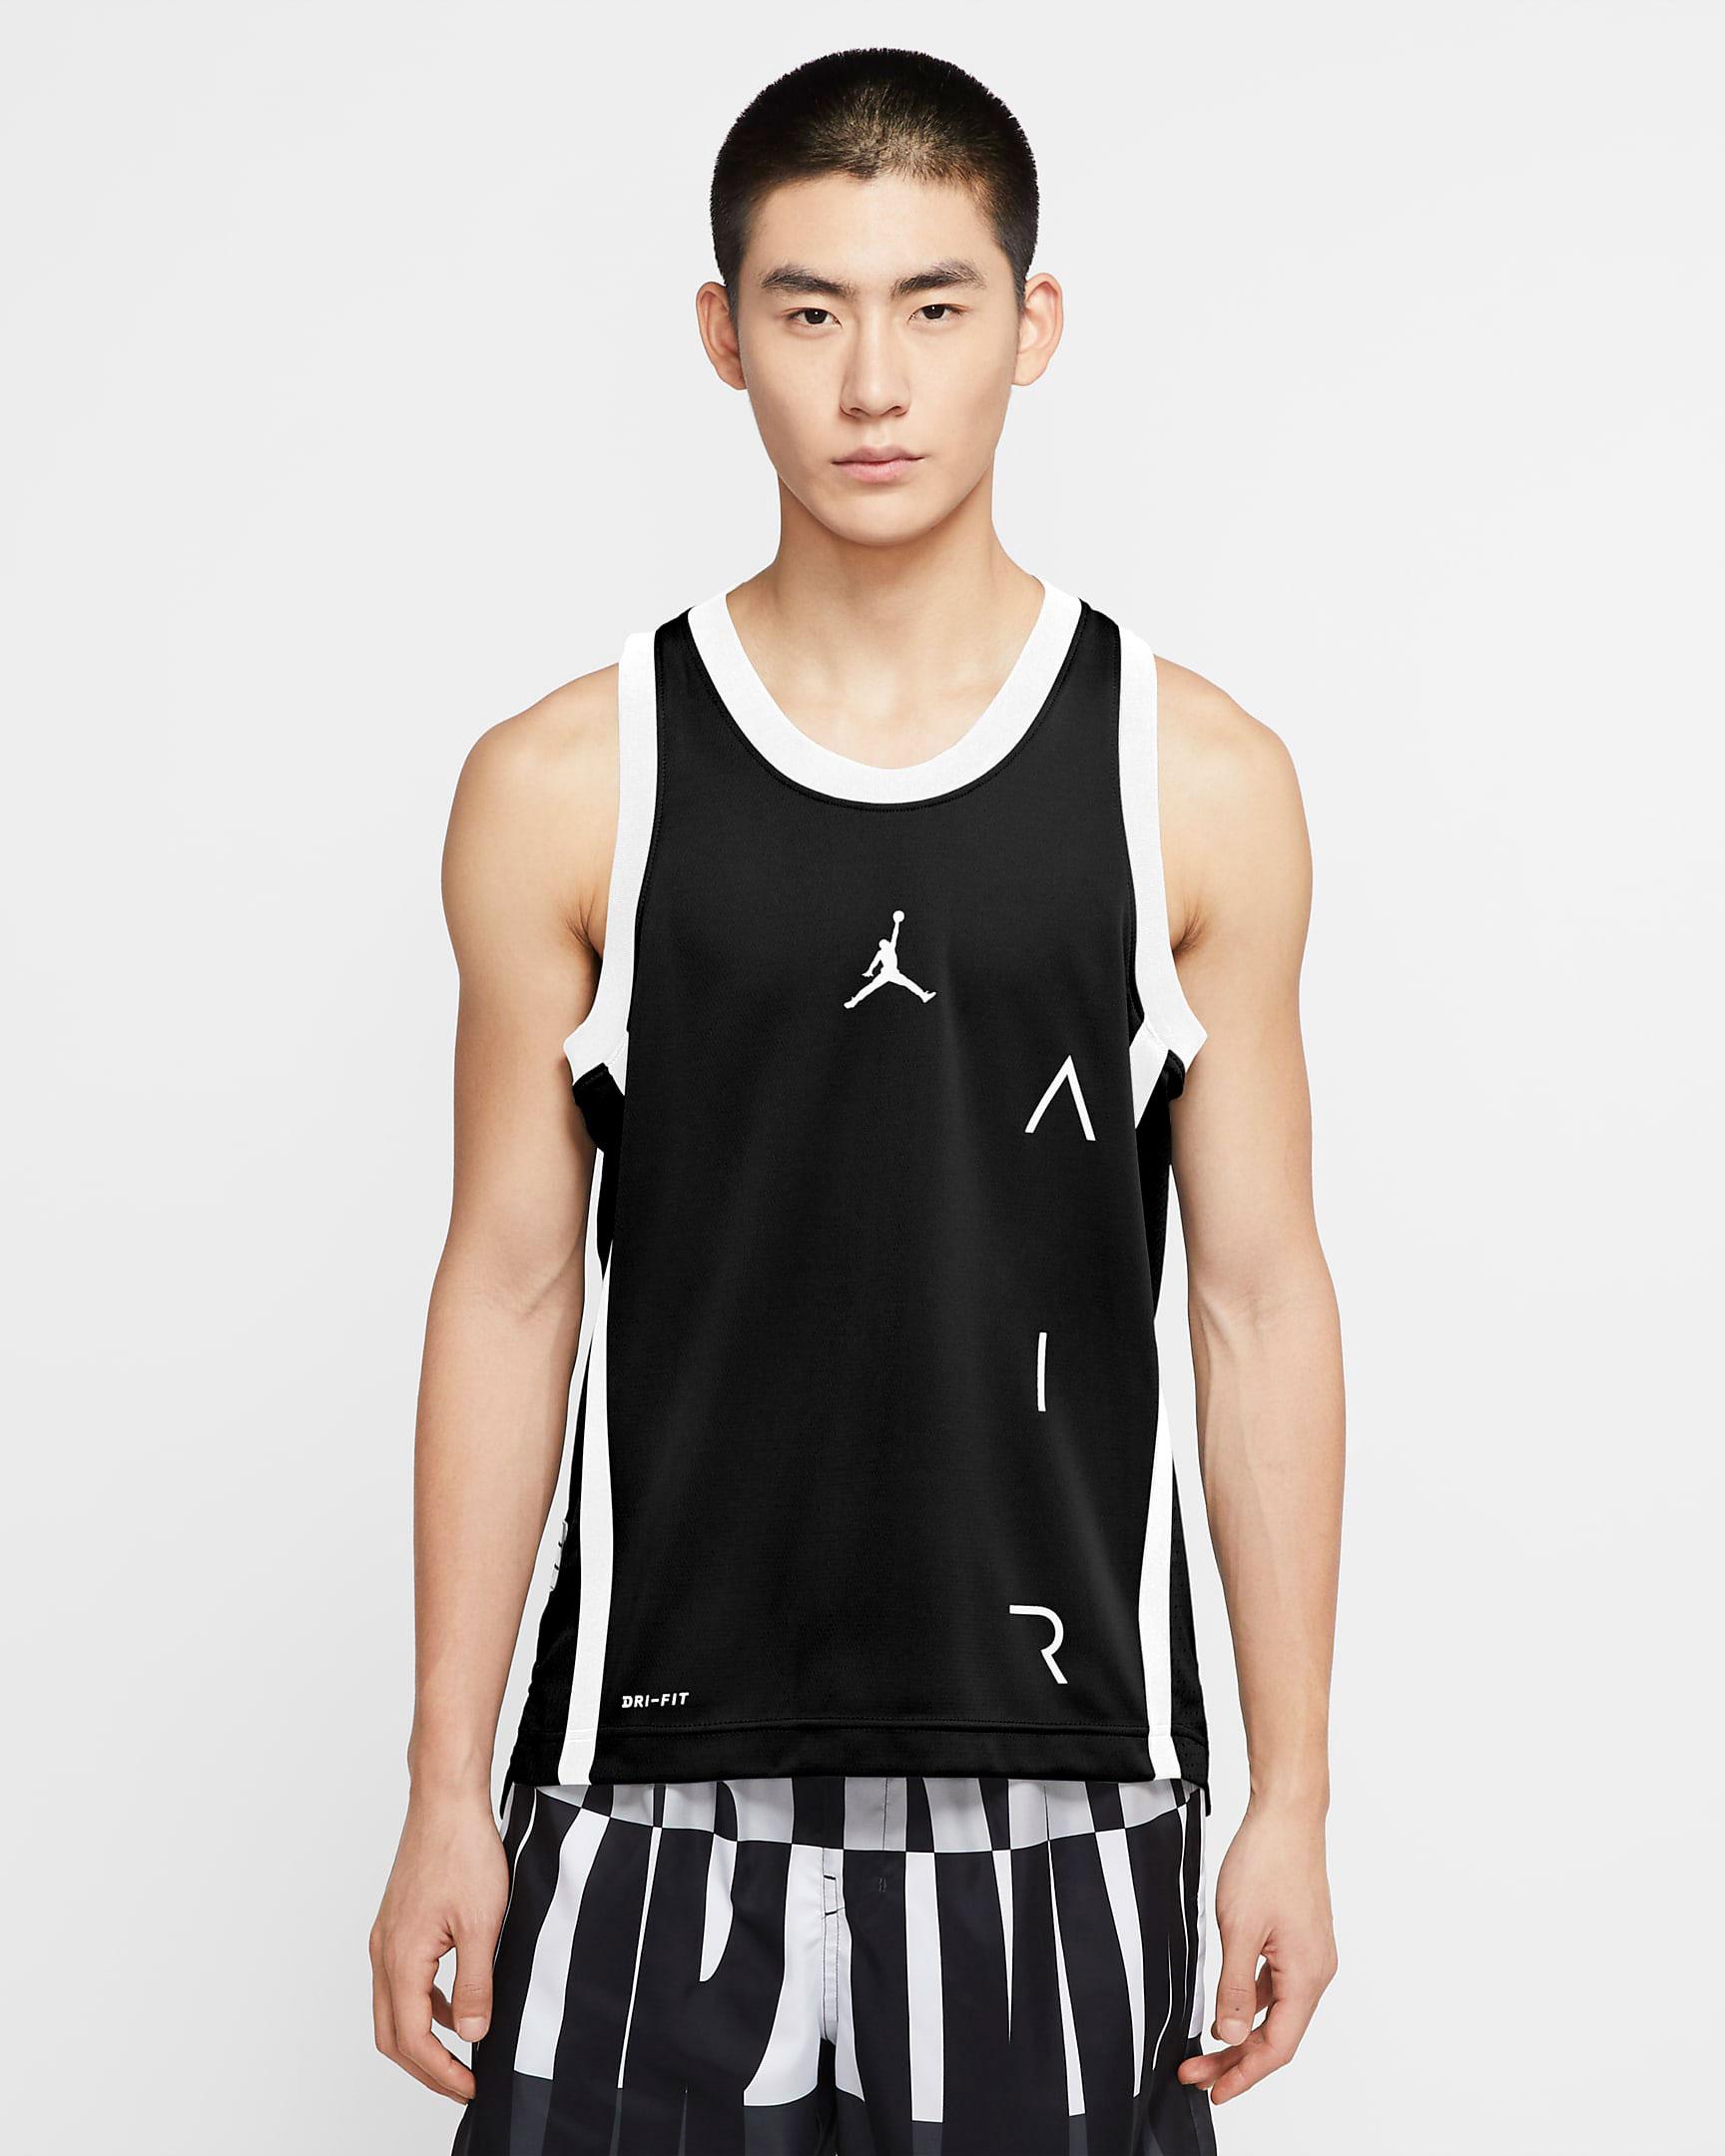 air-jordan-11-jubilee-black-white-jordan-jersey-1